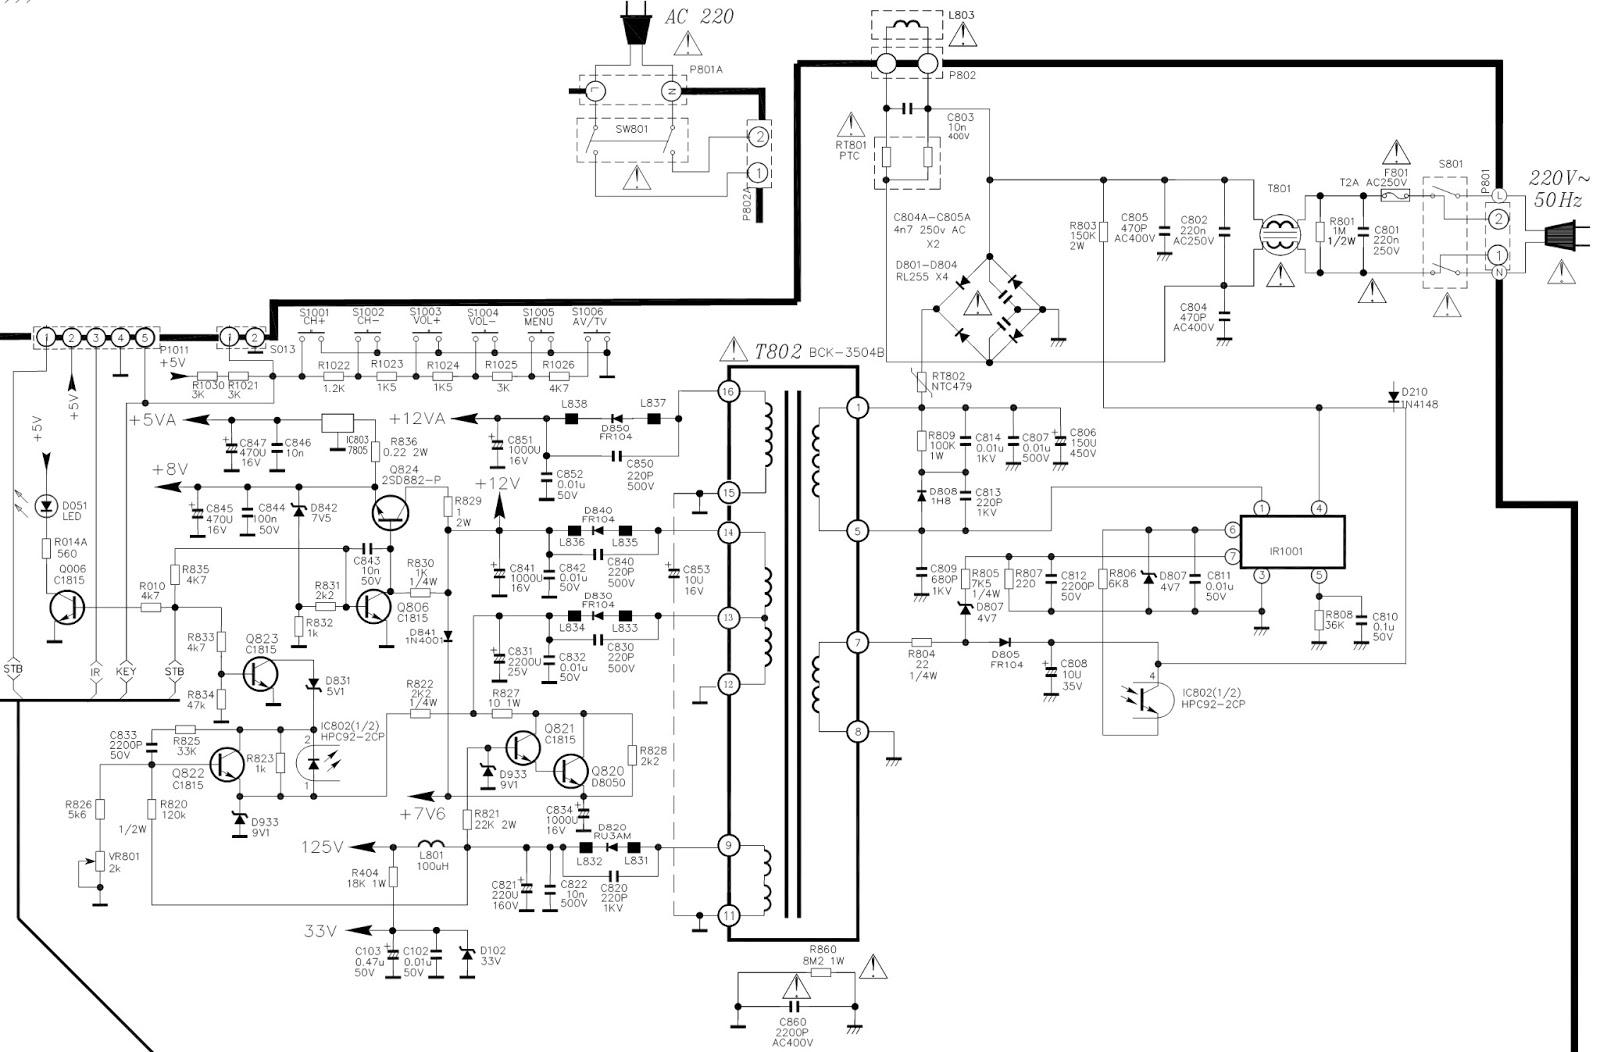 Tcl 21v12s Schematic Diagram Circuit Using Ics Of La76931 Stv9302 As1213 La4266 La4267 24c16